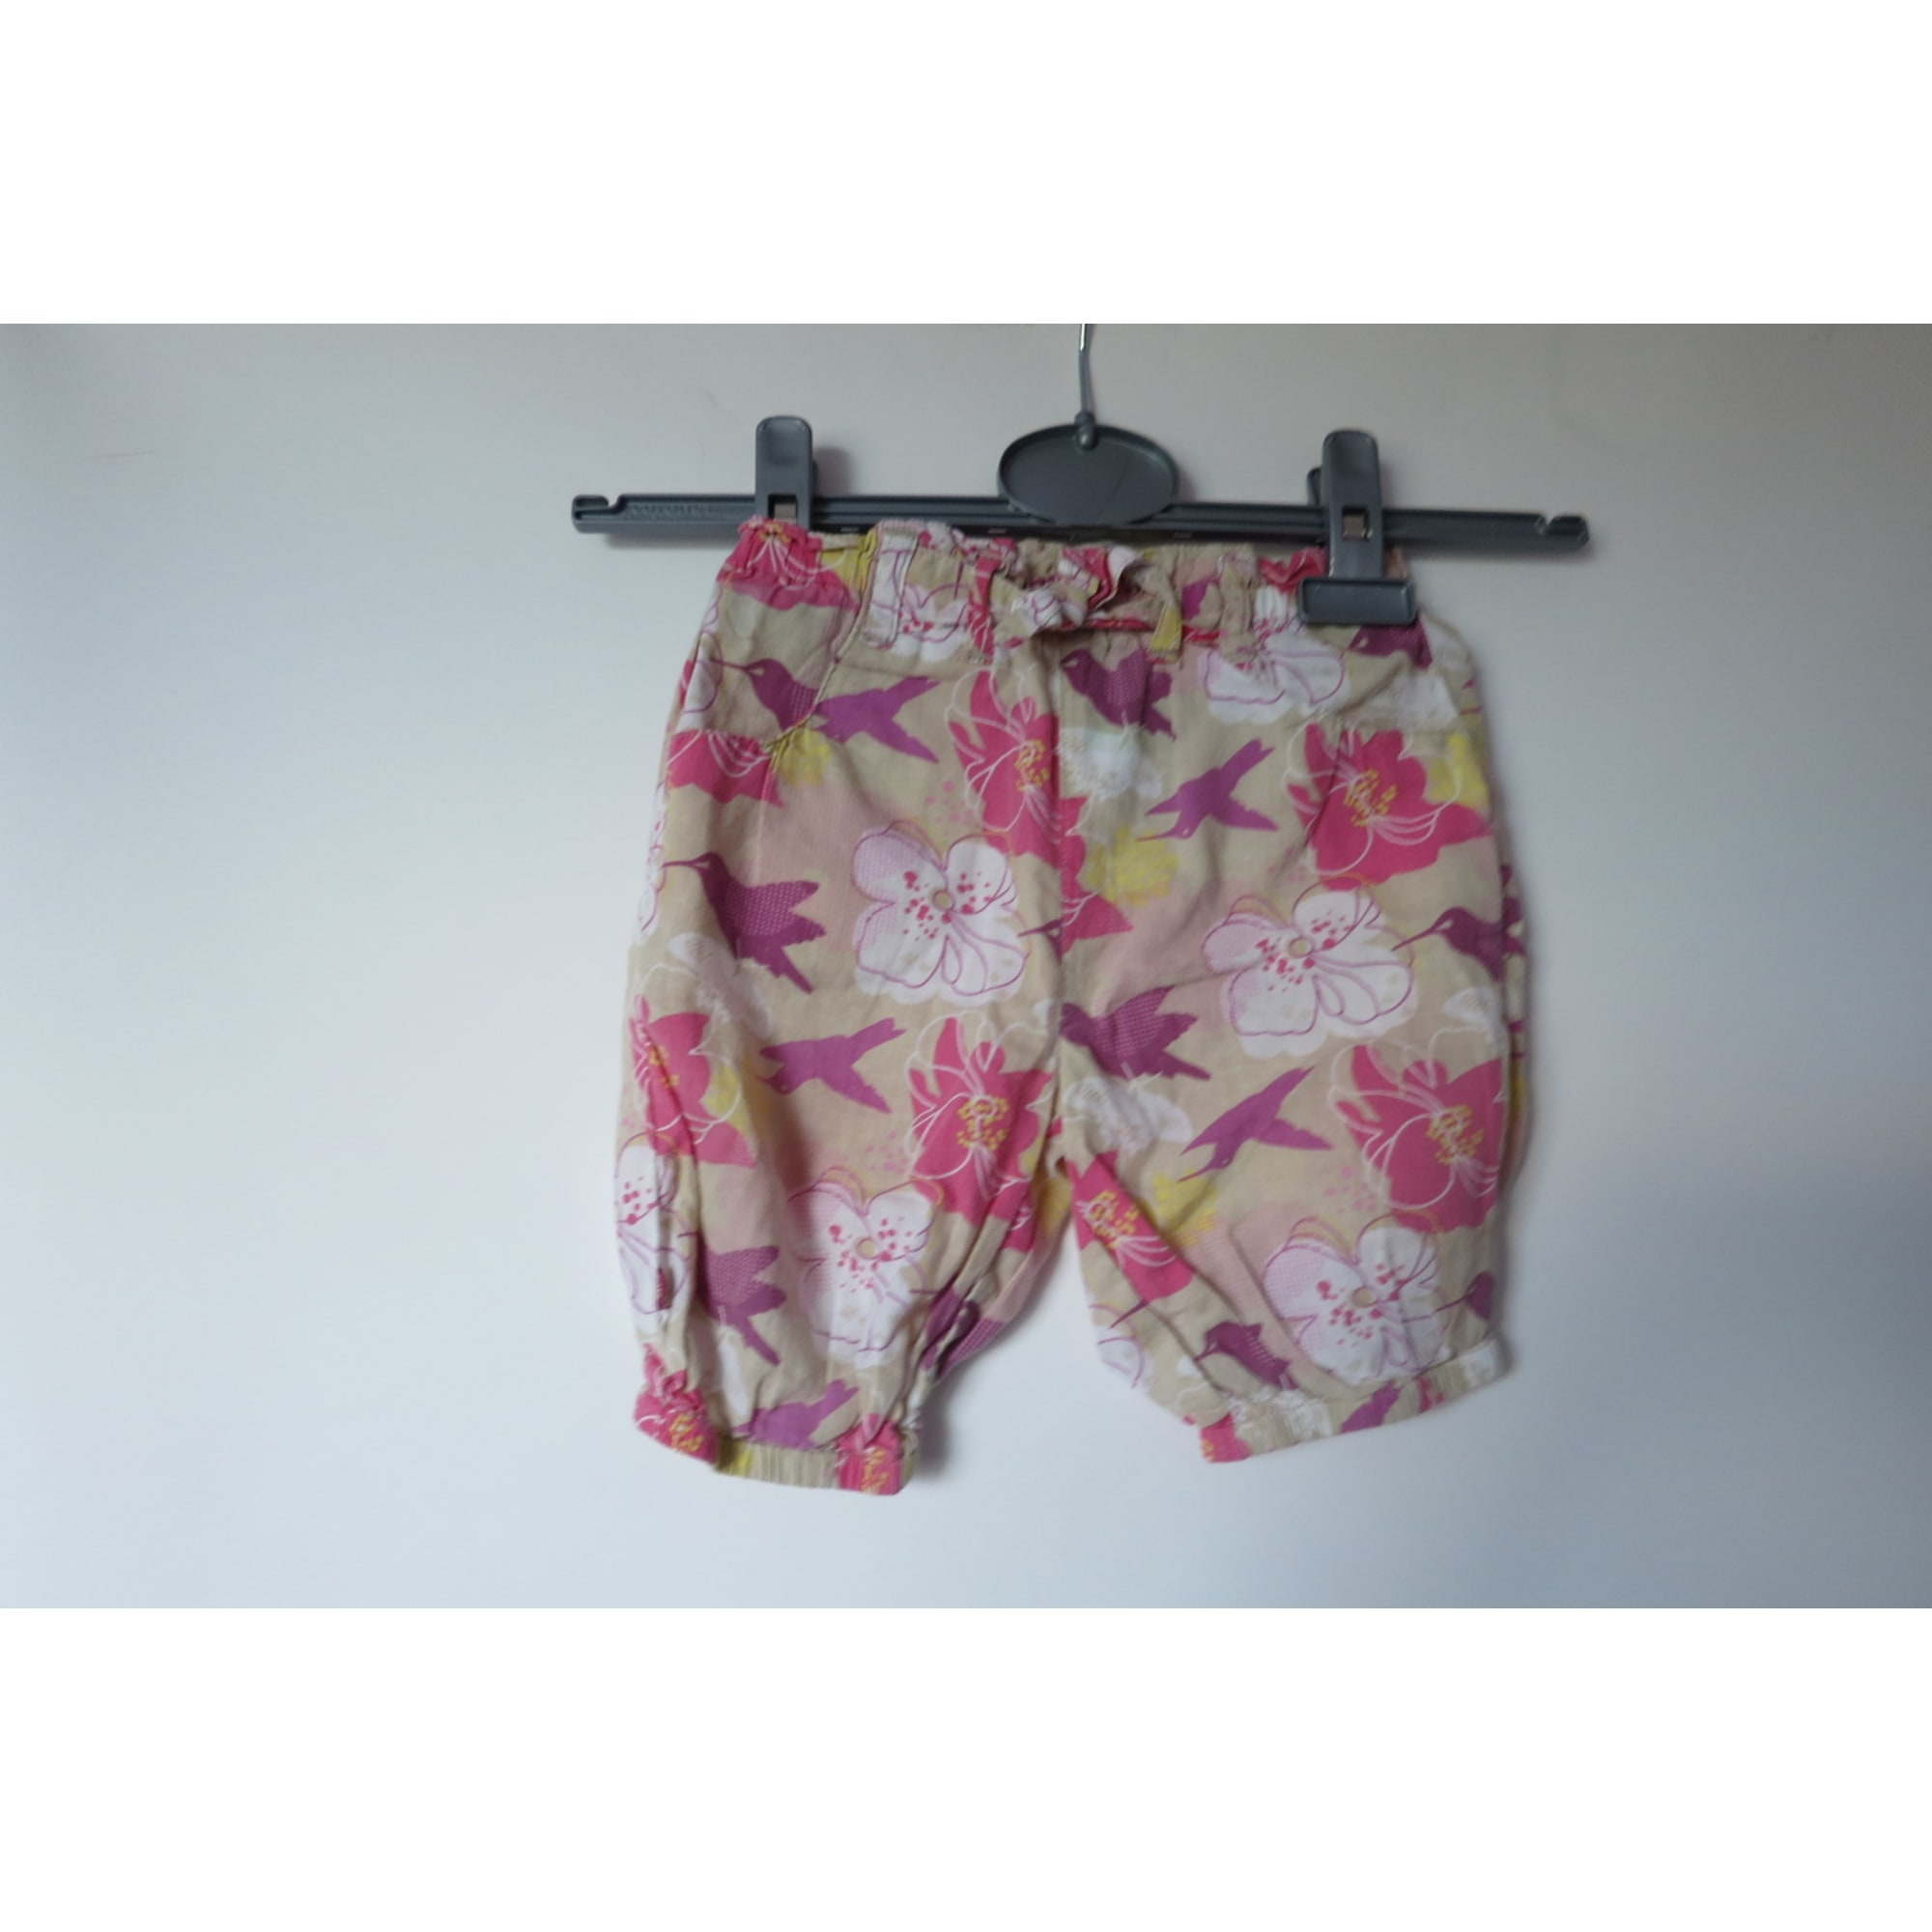 Bermuda Shorts OBAIBI Pink, fuchsia, light pink